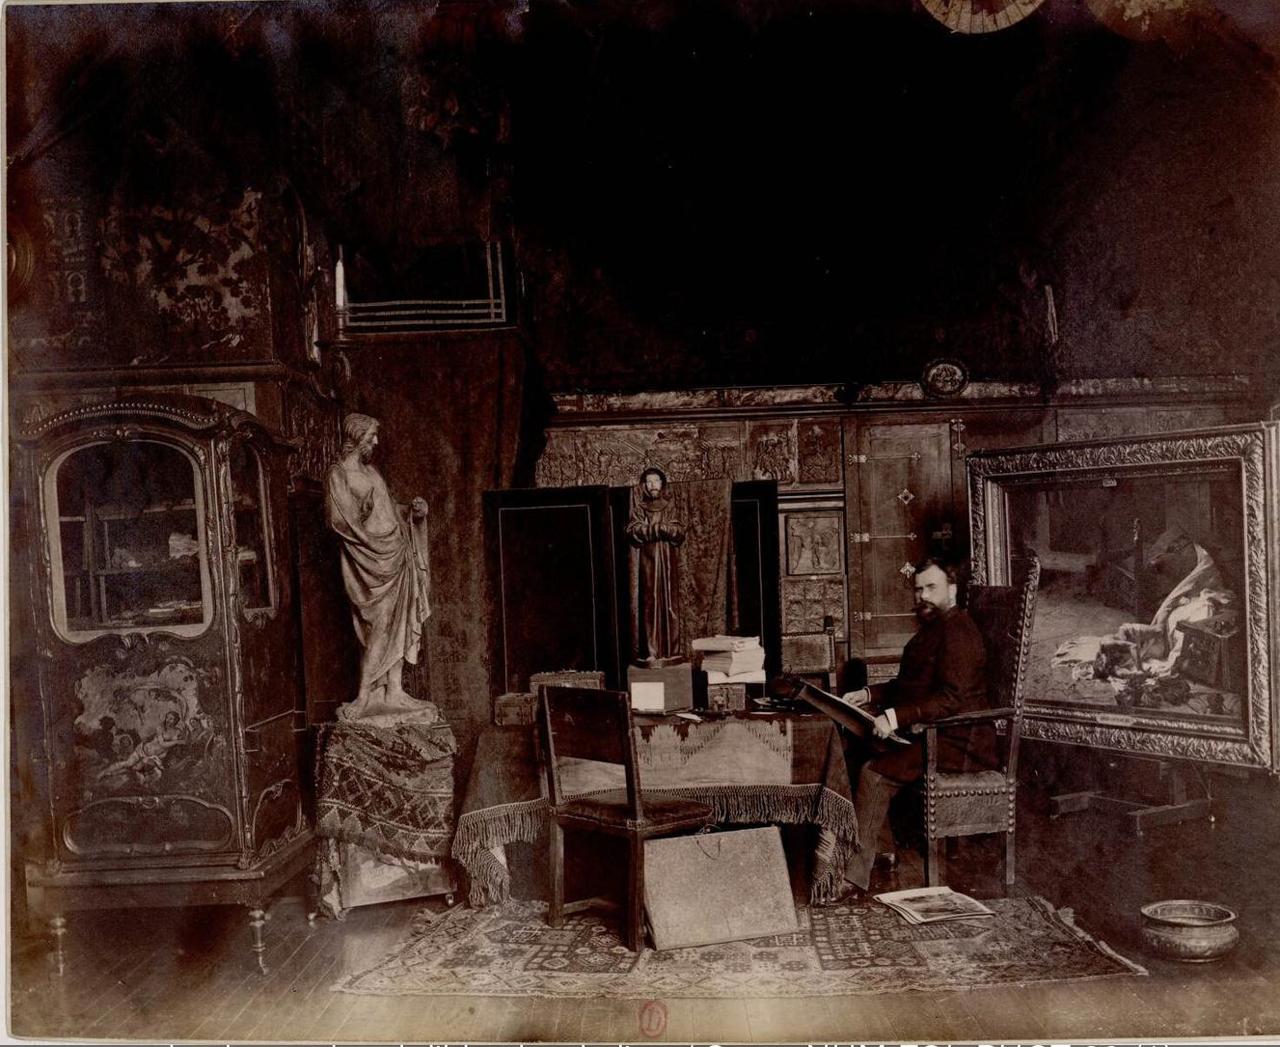 Альбер Пьер Рене Меньян (1845-1908) художник